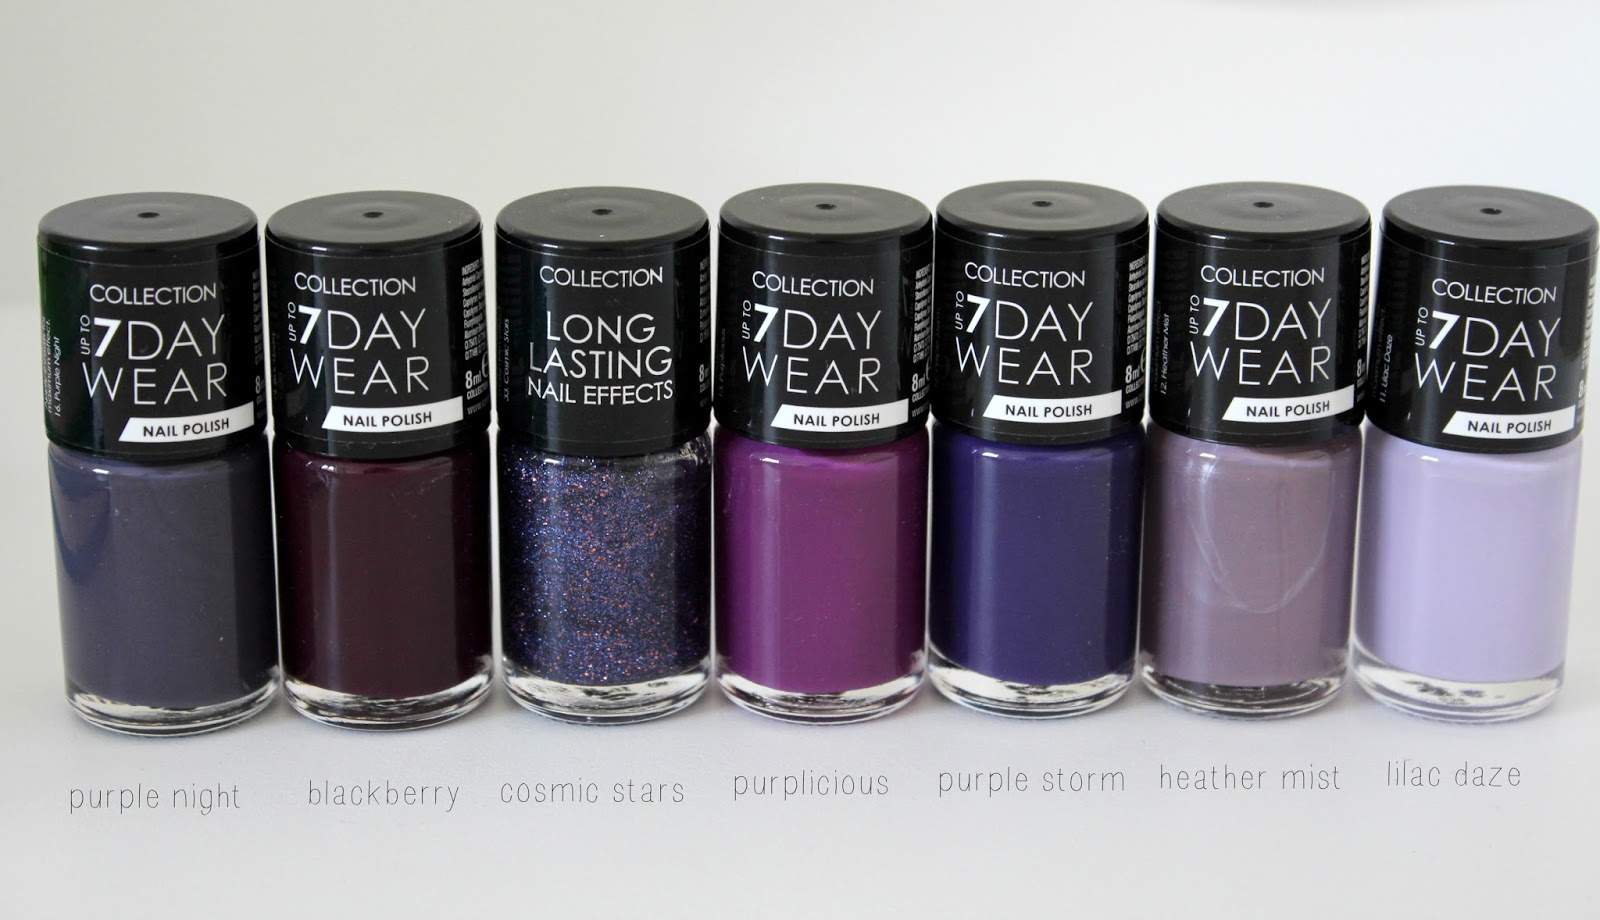 Collection 7 Day Wear & Long Lasting Nail Polishes ♡ | Brogan Tate